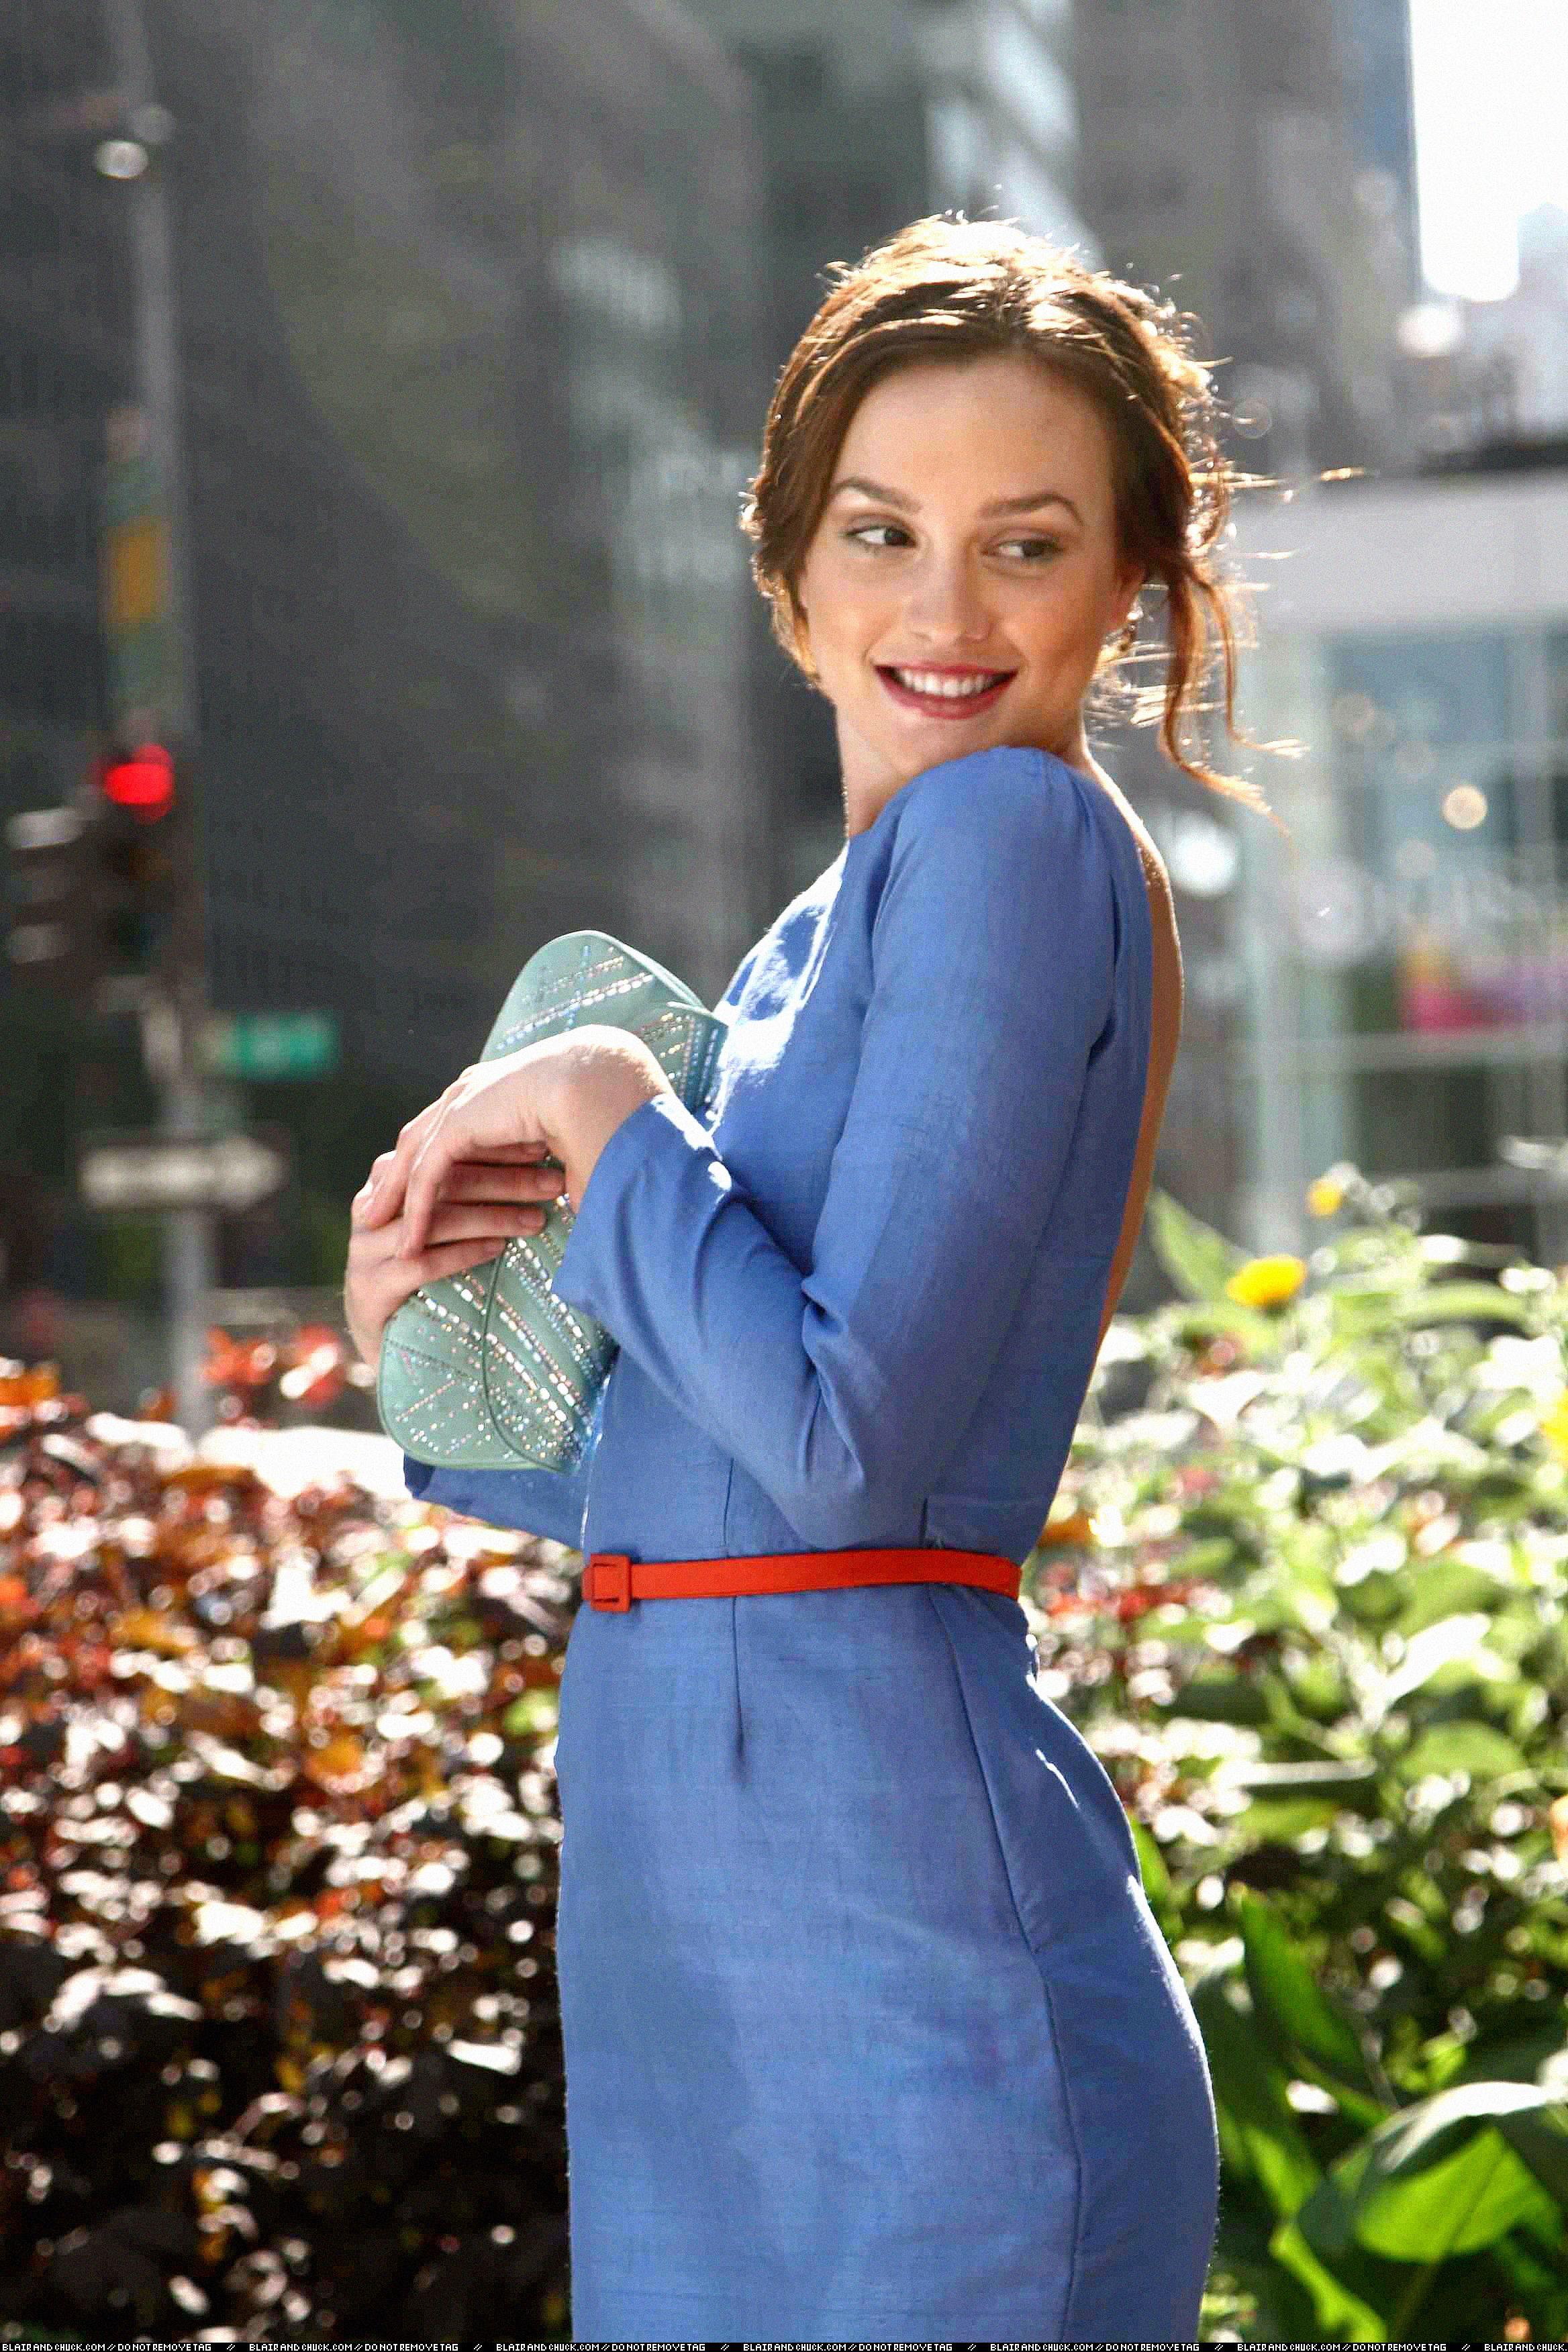 Blair waldorflove the dress gossip girl outfits